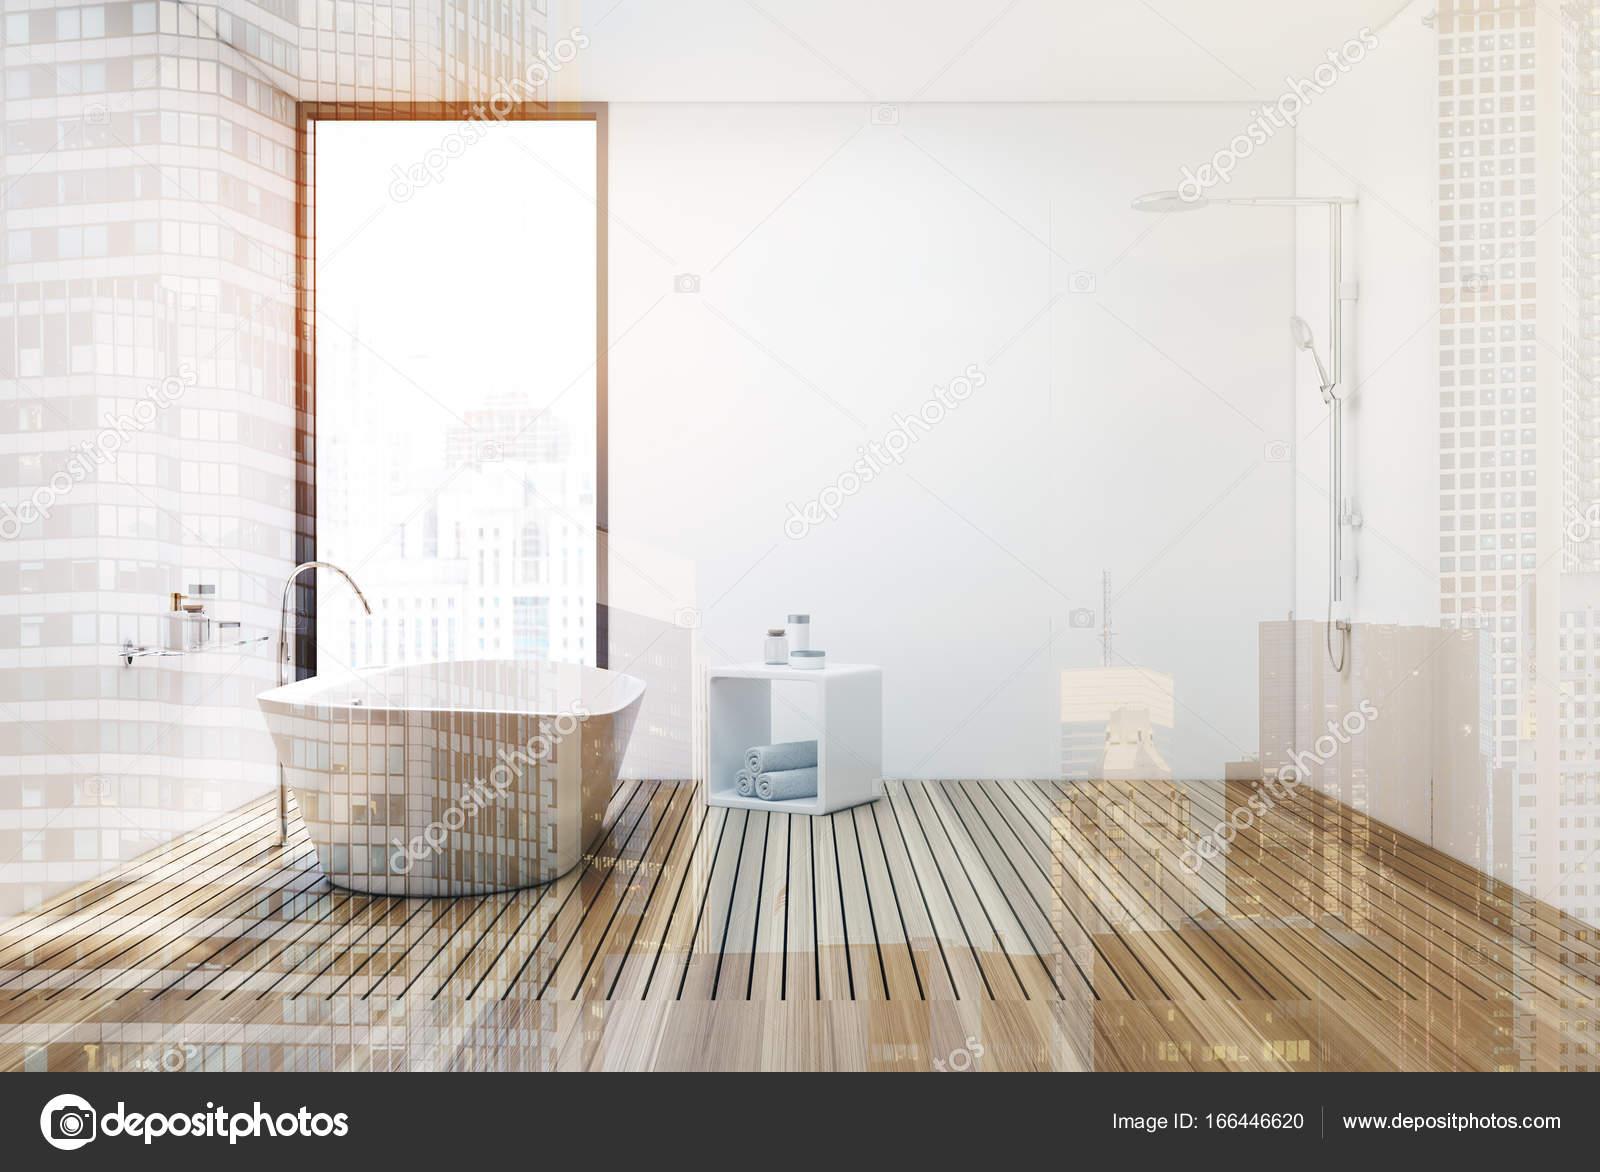 Badkamer Douche Vloeren : Houten vloer badkamer en douche dubbele u stockfoto